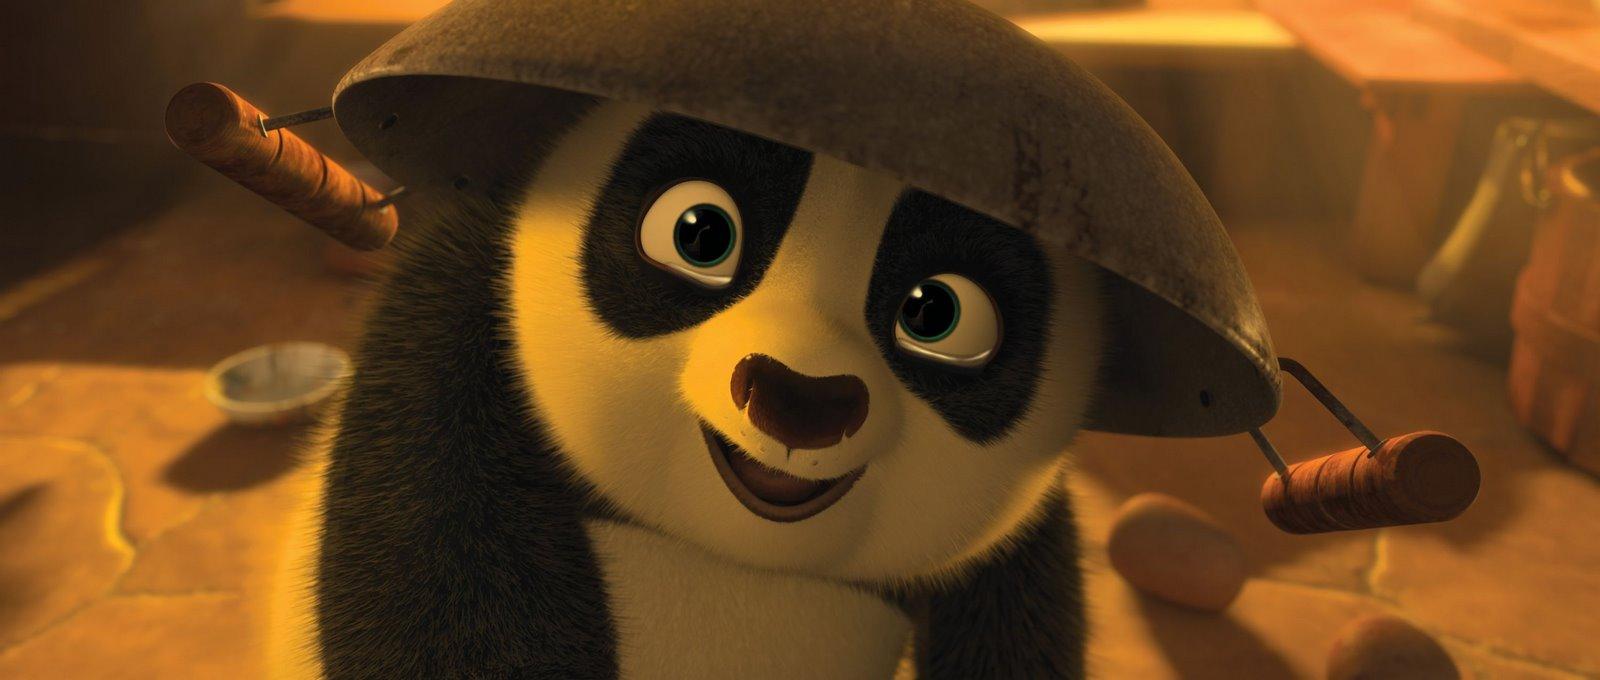 Imagens Para Colorir Do Kung Fu Panda